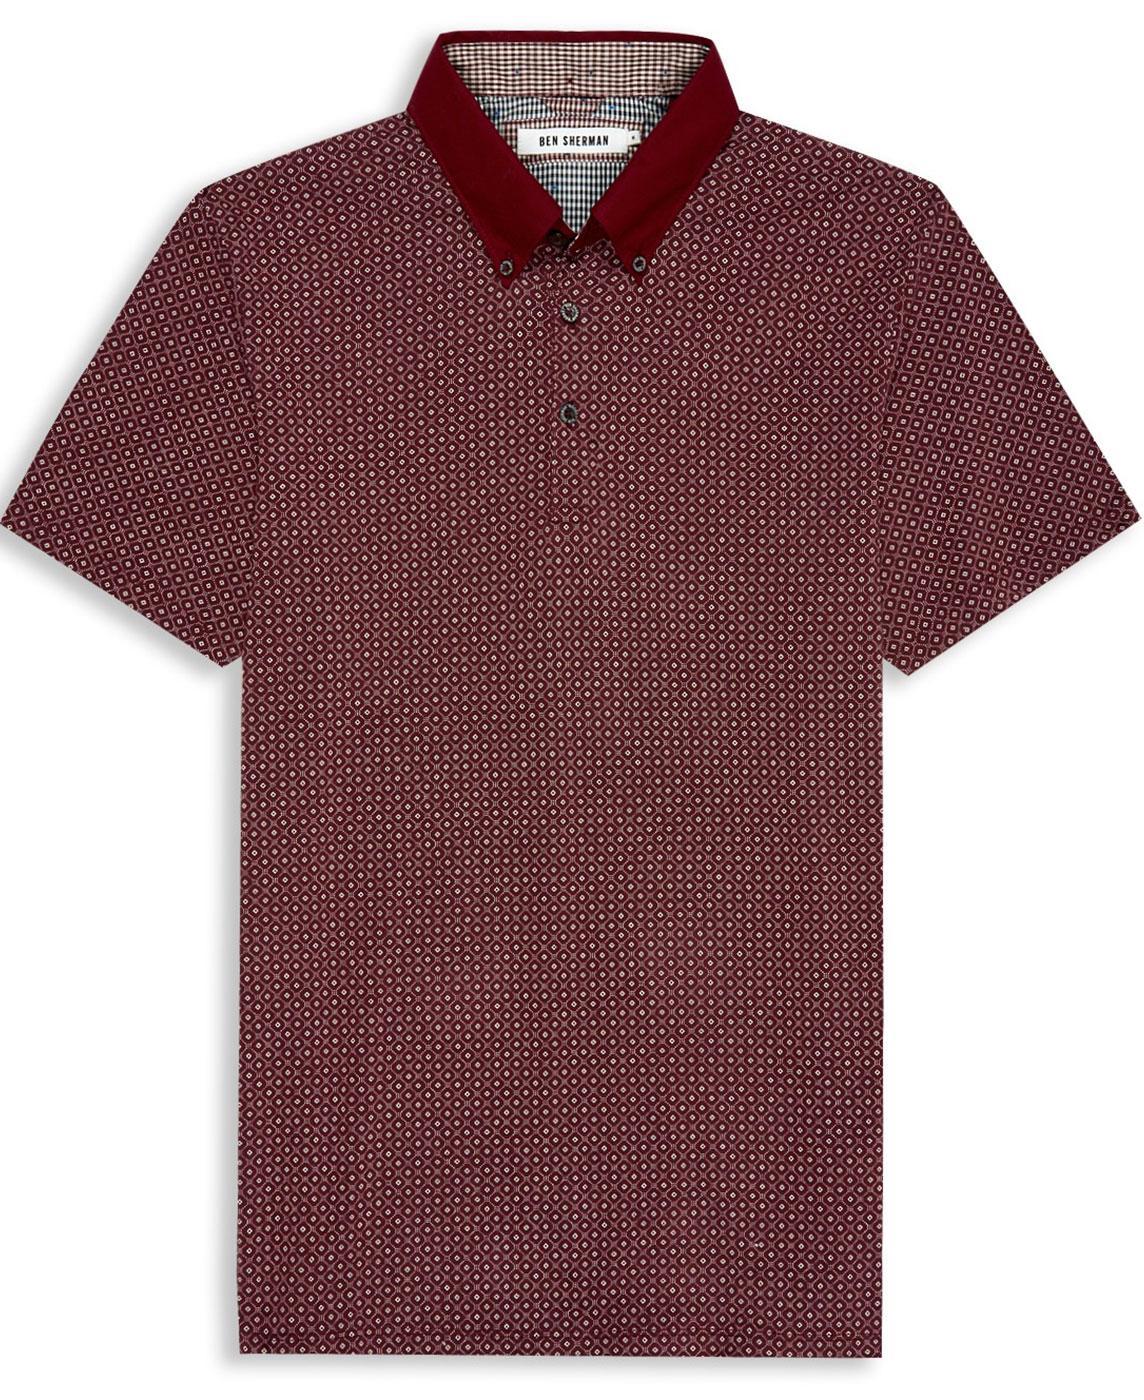 ben sherman retro mod geometric tile print polo shirt in port. Black Bedroom Furniture Sets. Home Design Ideas